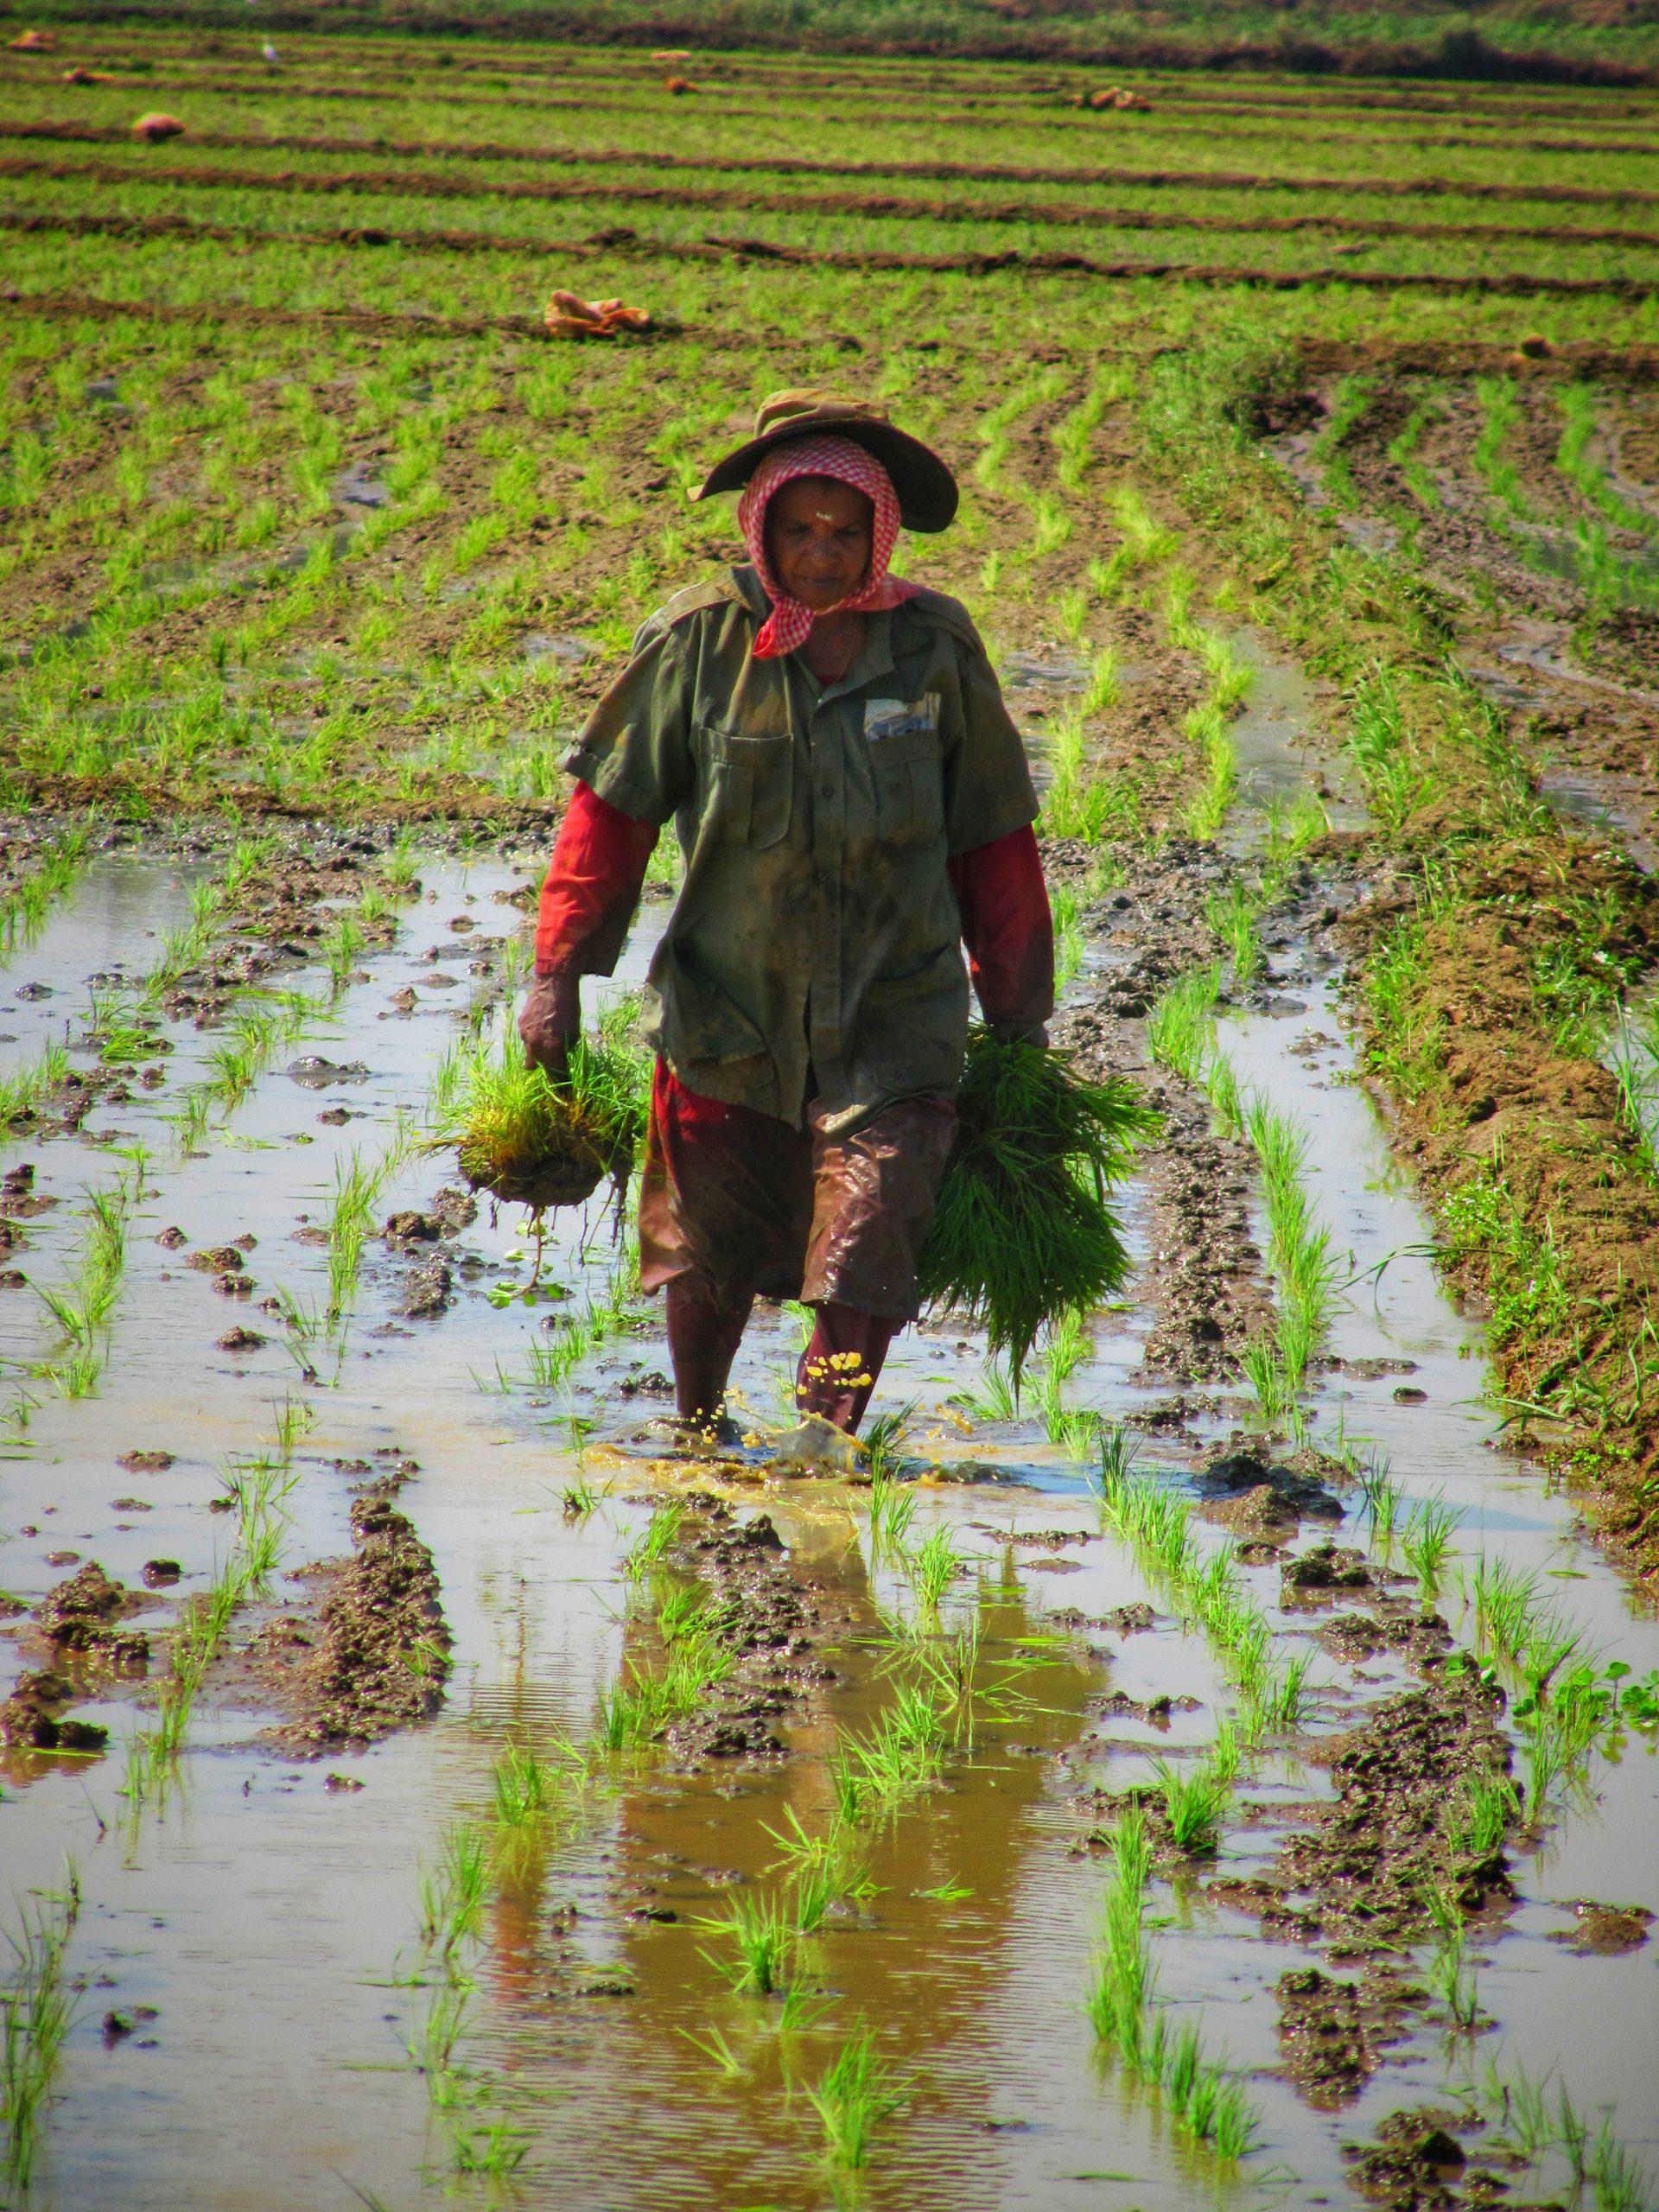 Farmer on Paddy field